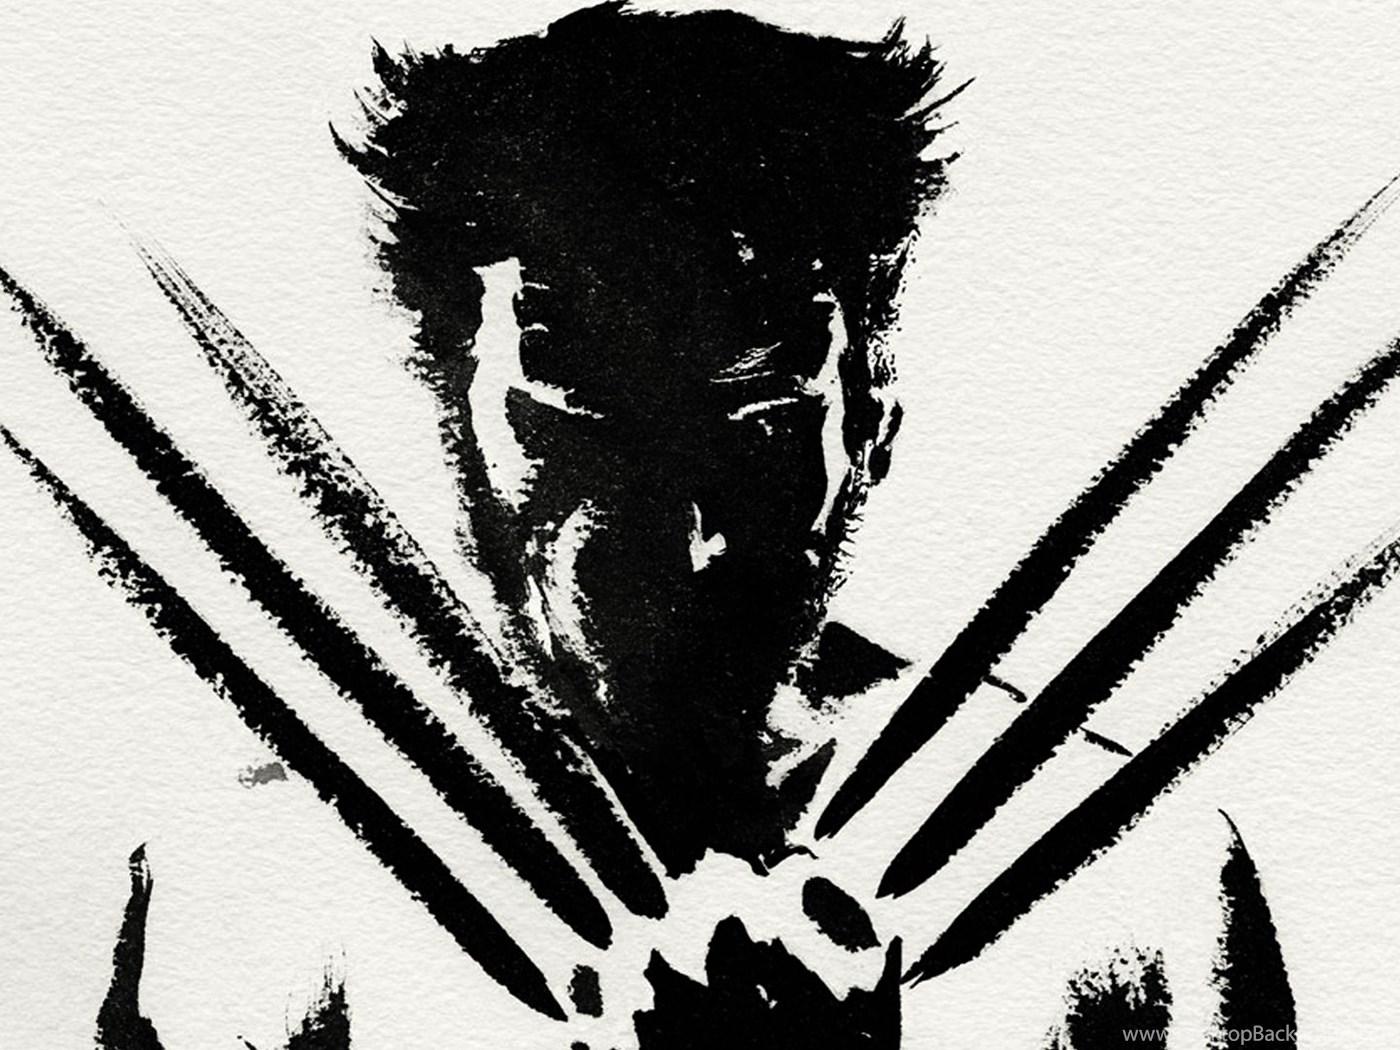 Marvels The Wolverine 2013 Movie Hd Wallpapers Desktop Wallpapers